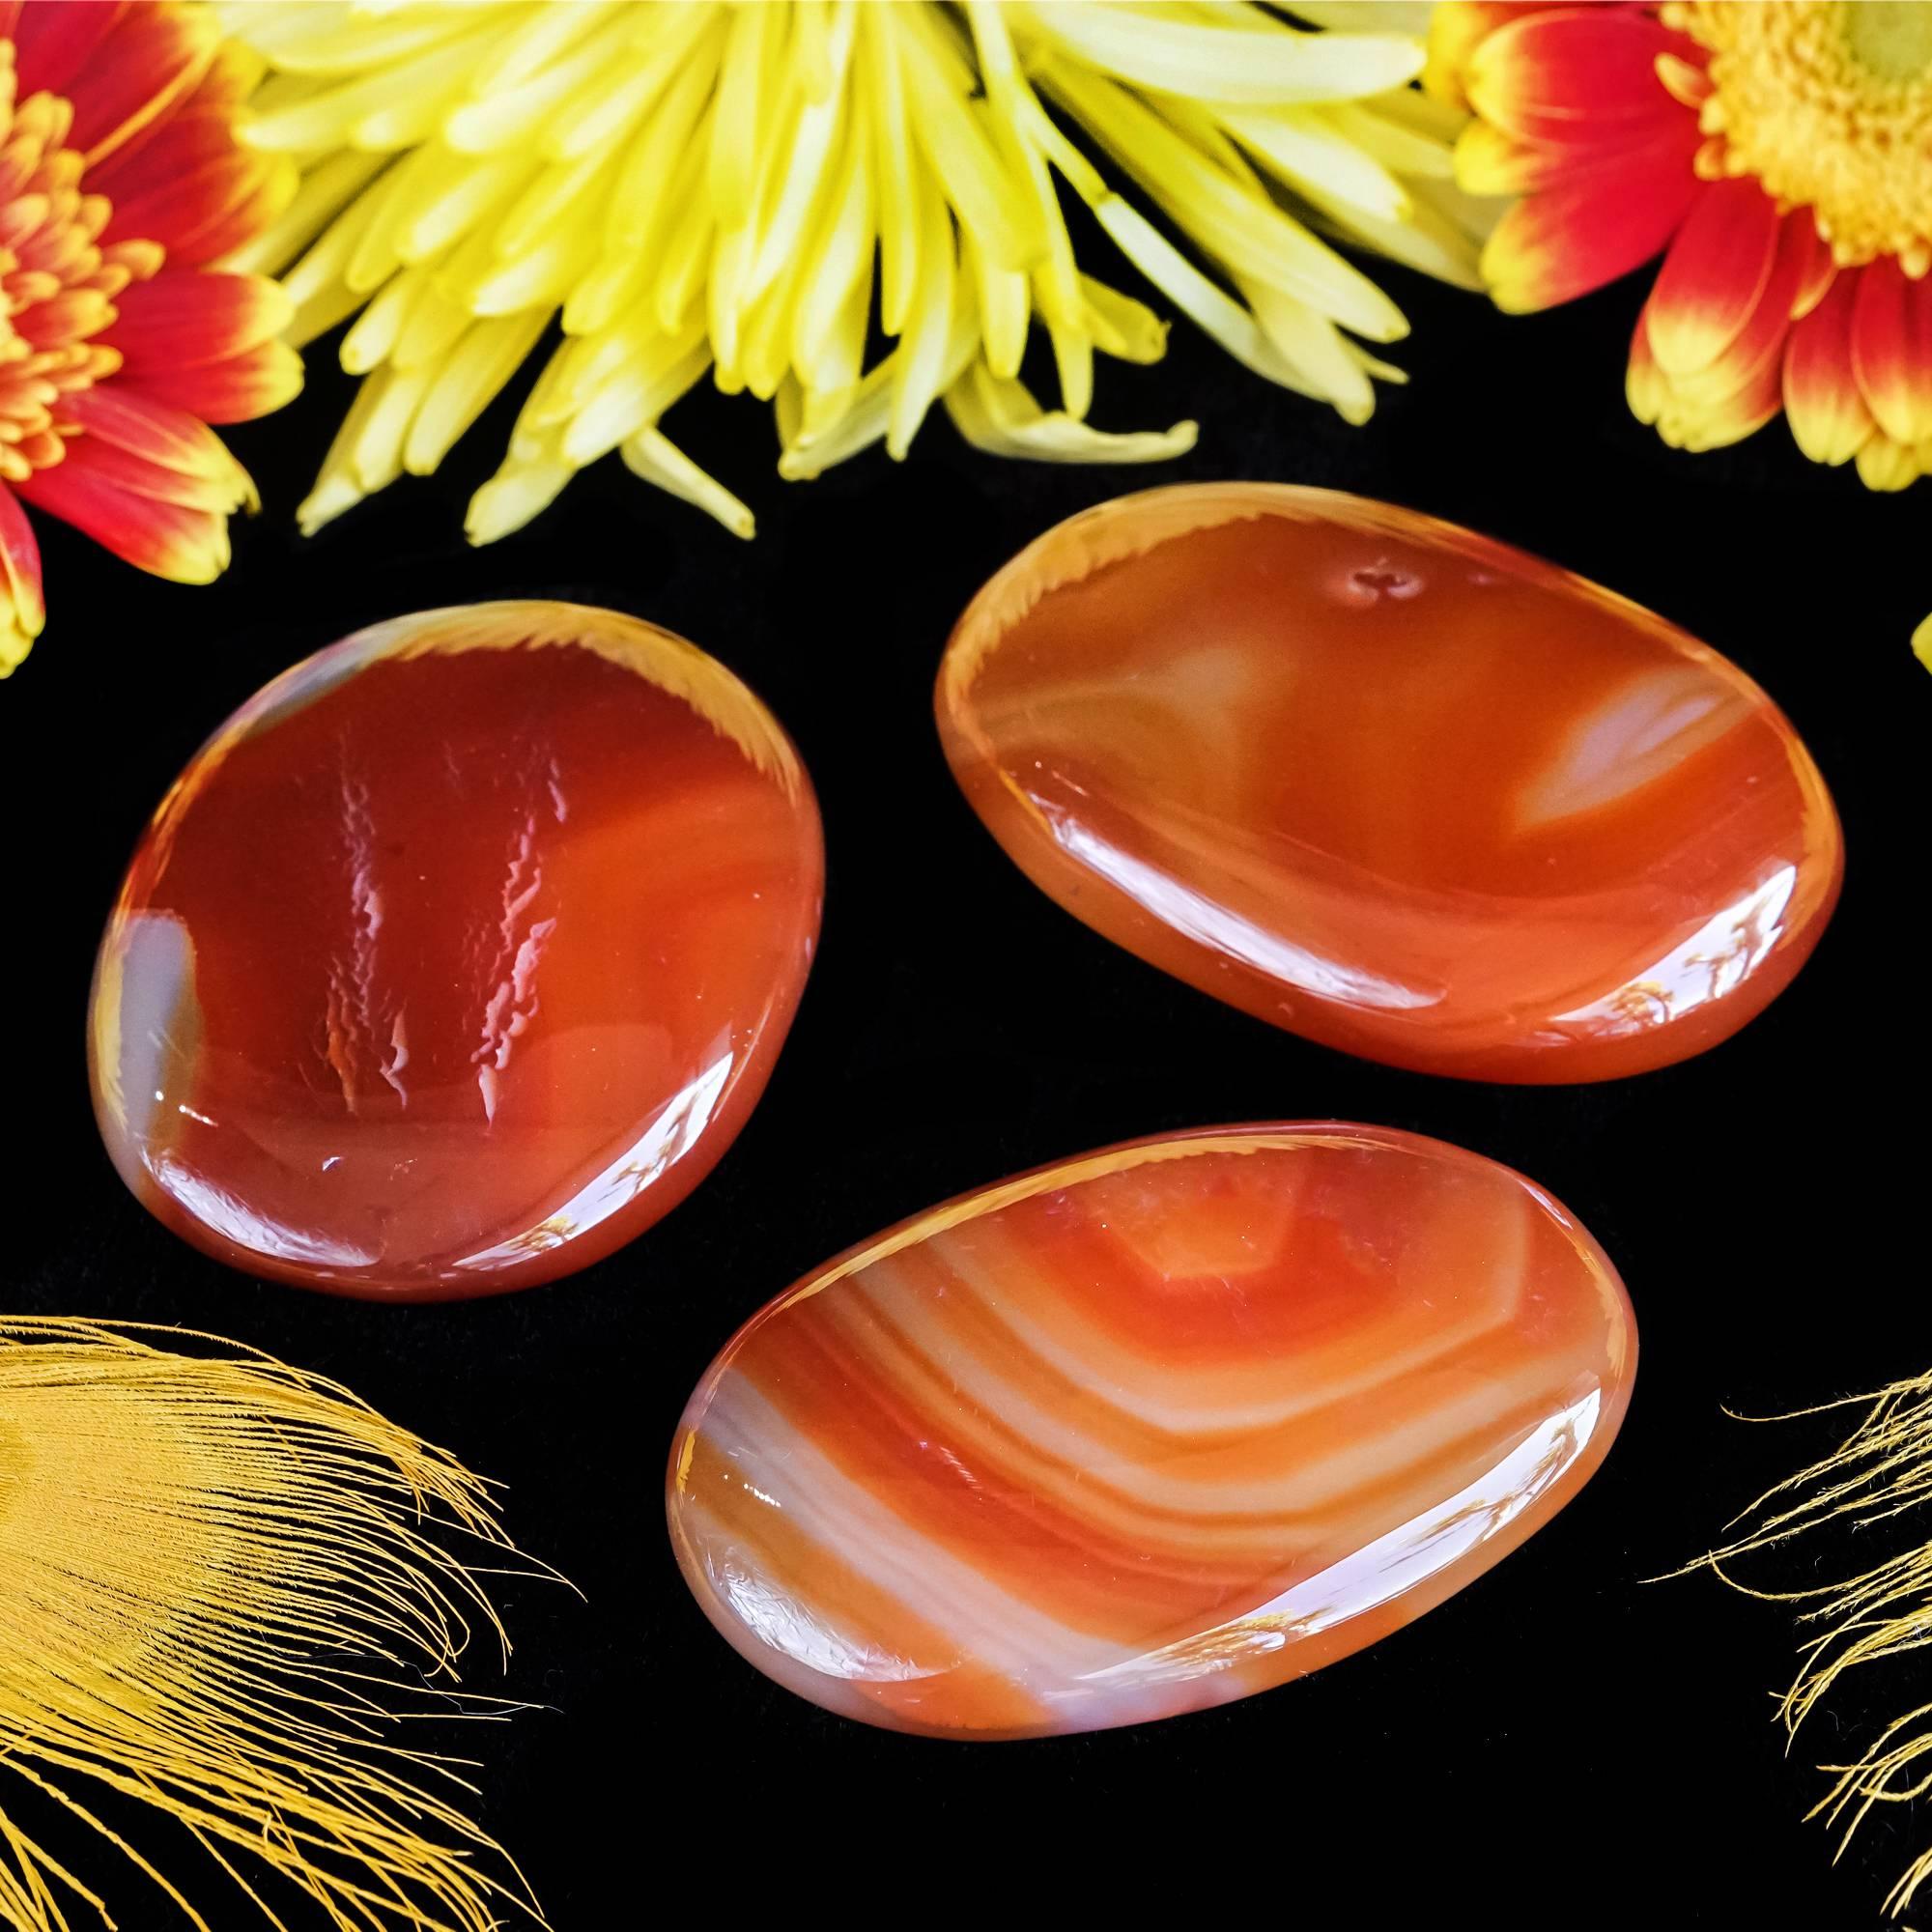 carnelian palm stones